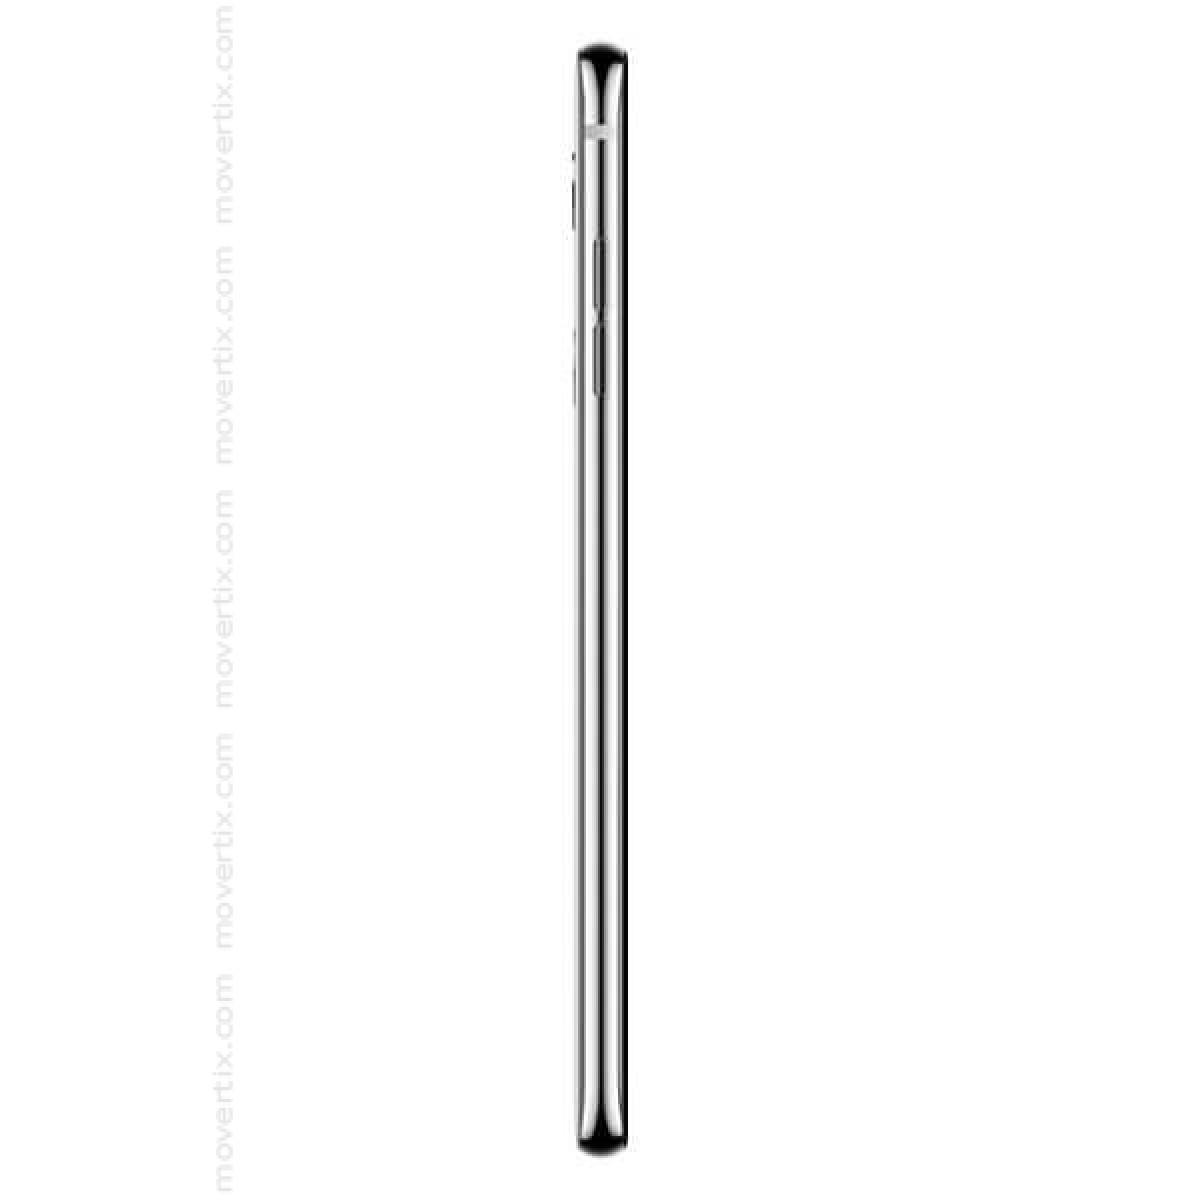 LG V30 Silver 64GB and 4GB RAM (H930)